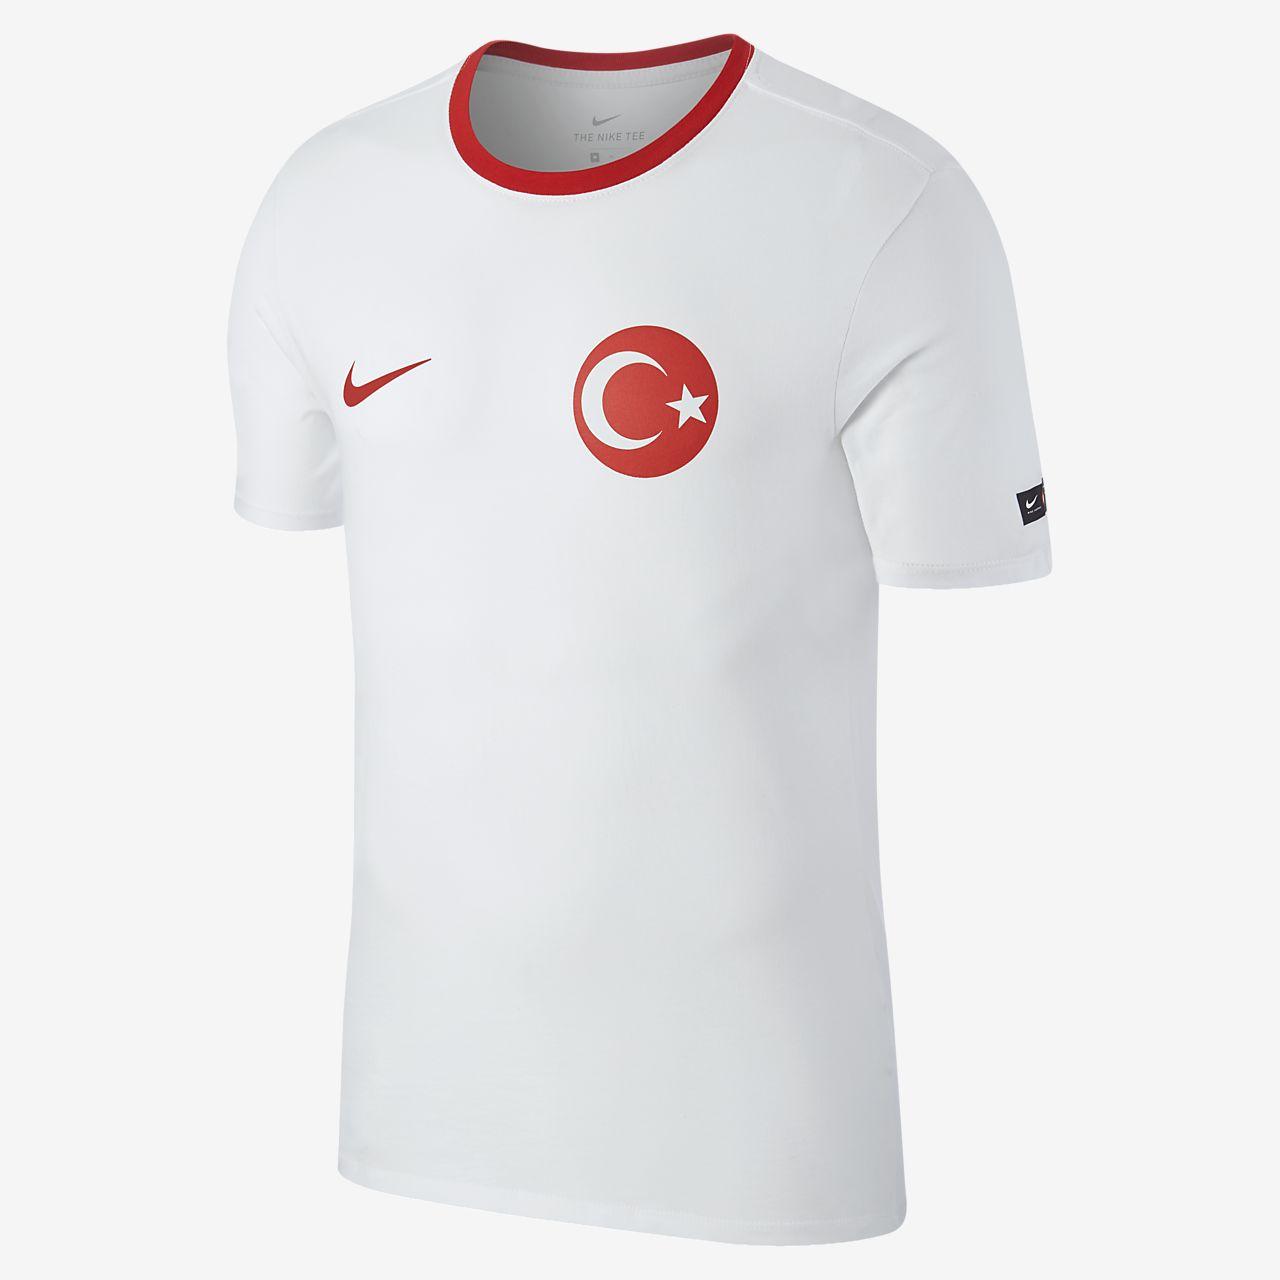 b4aa593fb95 Playera para hombre Turkey Crest. Nike.com MX